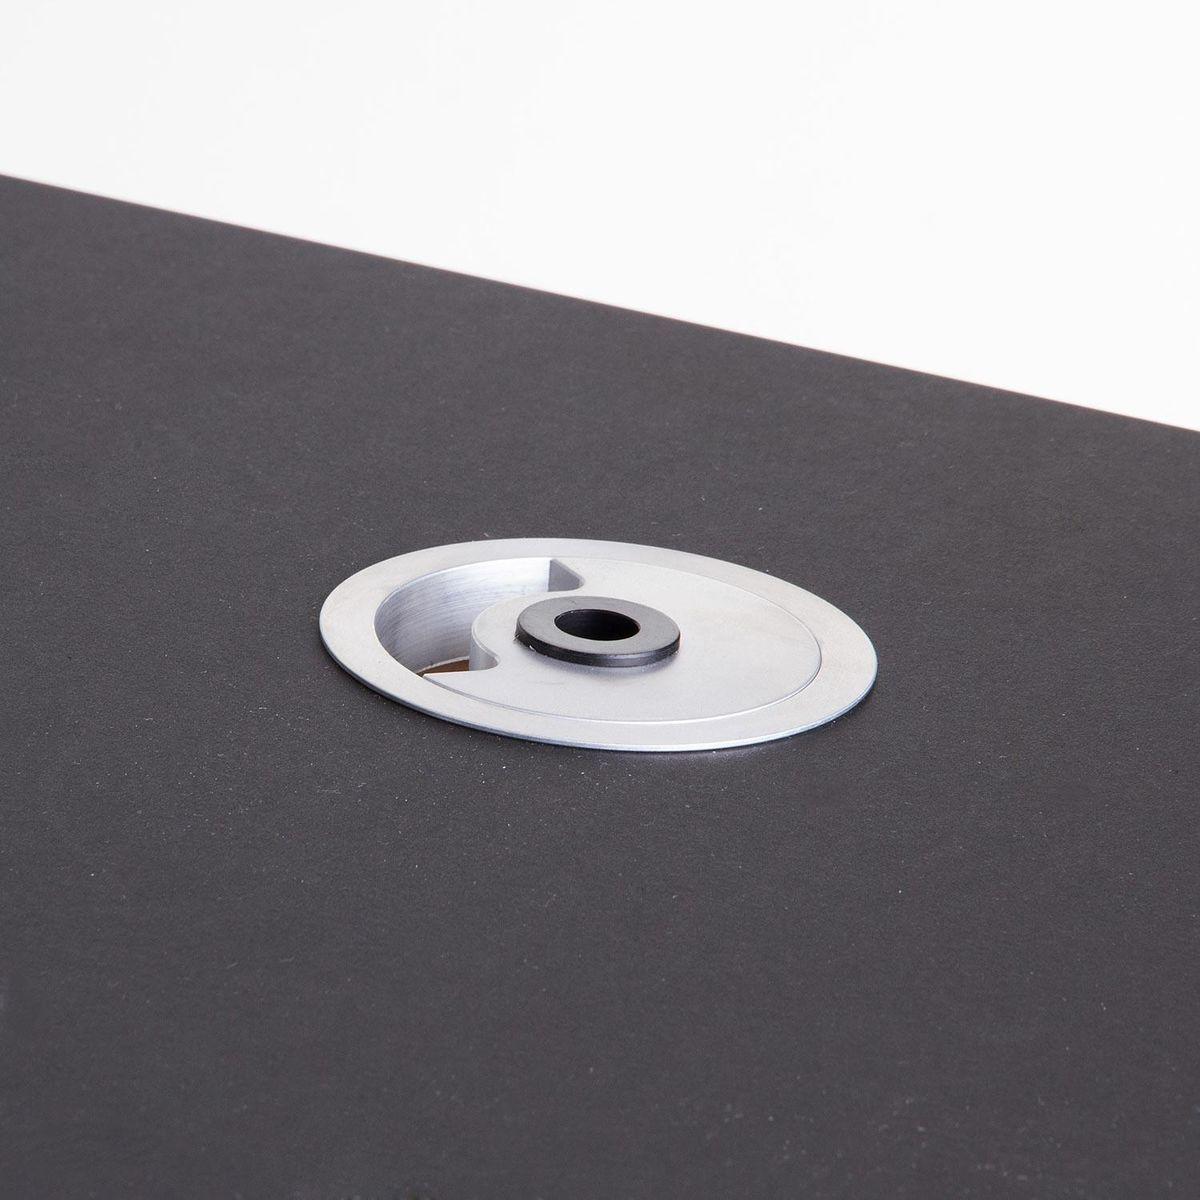 ha2 work height adjustable office table montana. Black Bedroom Furniture Sets. Home Design Ideas